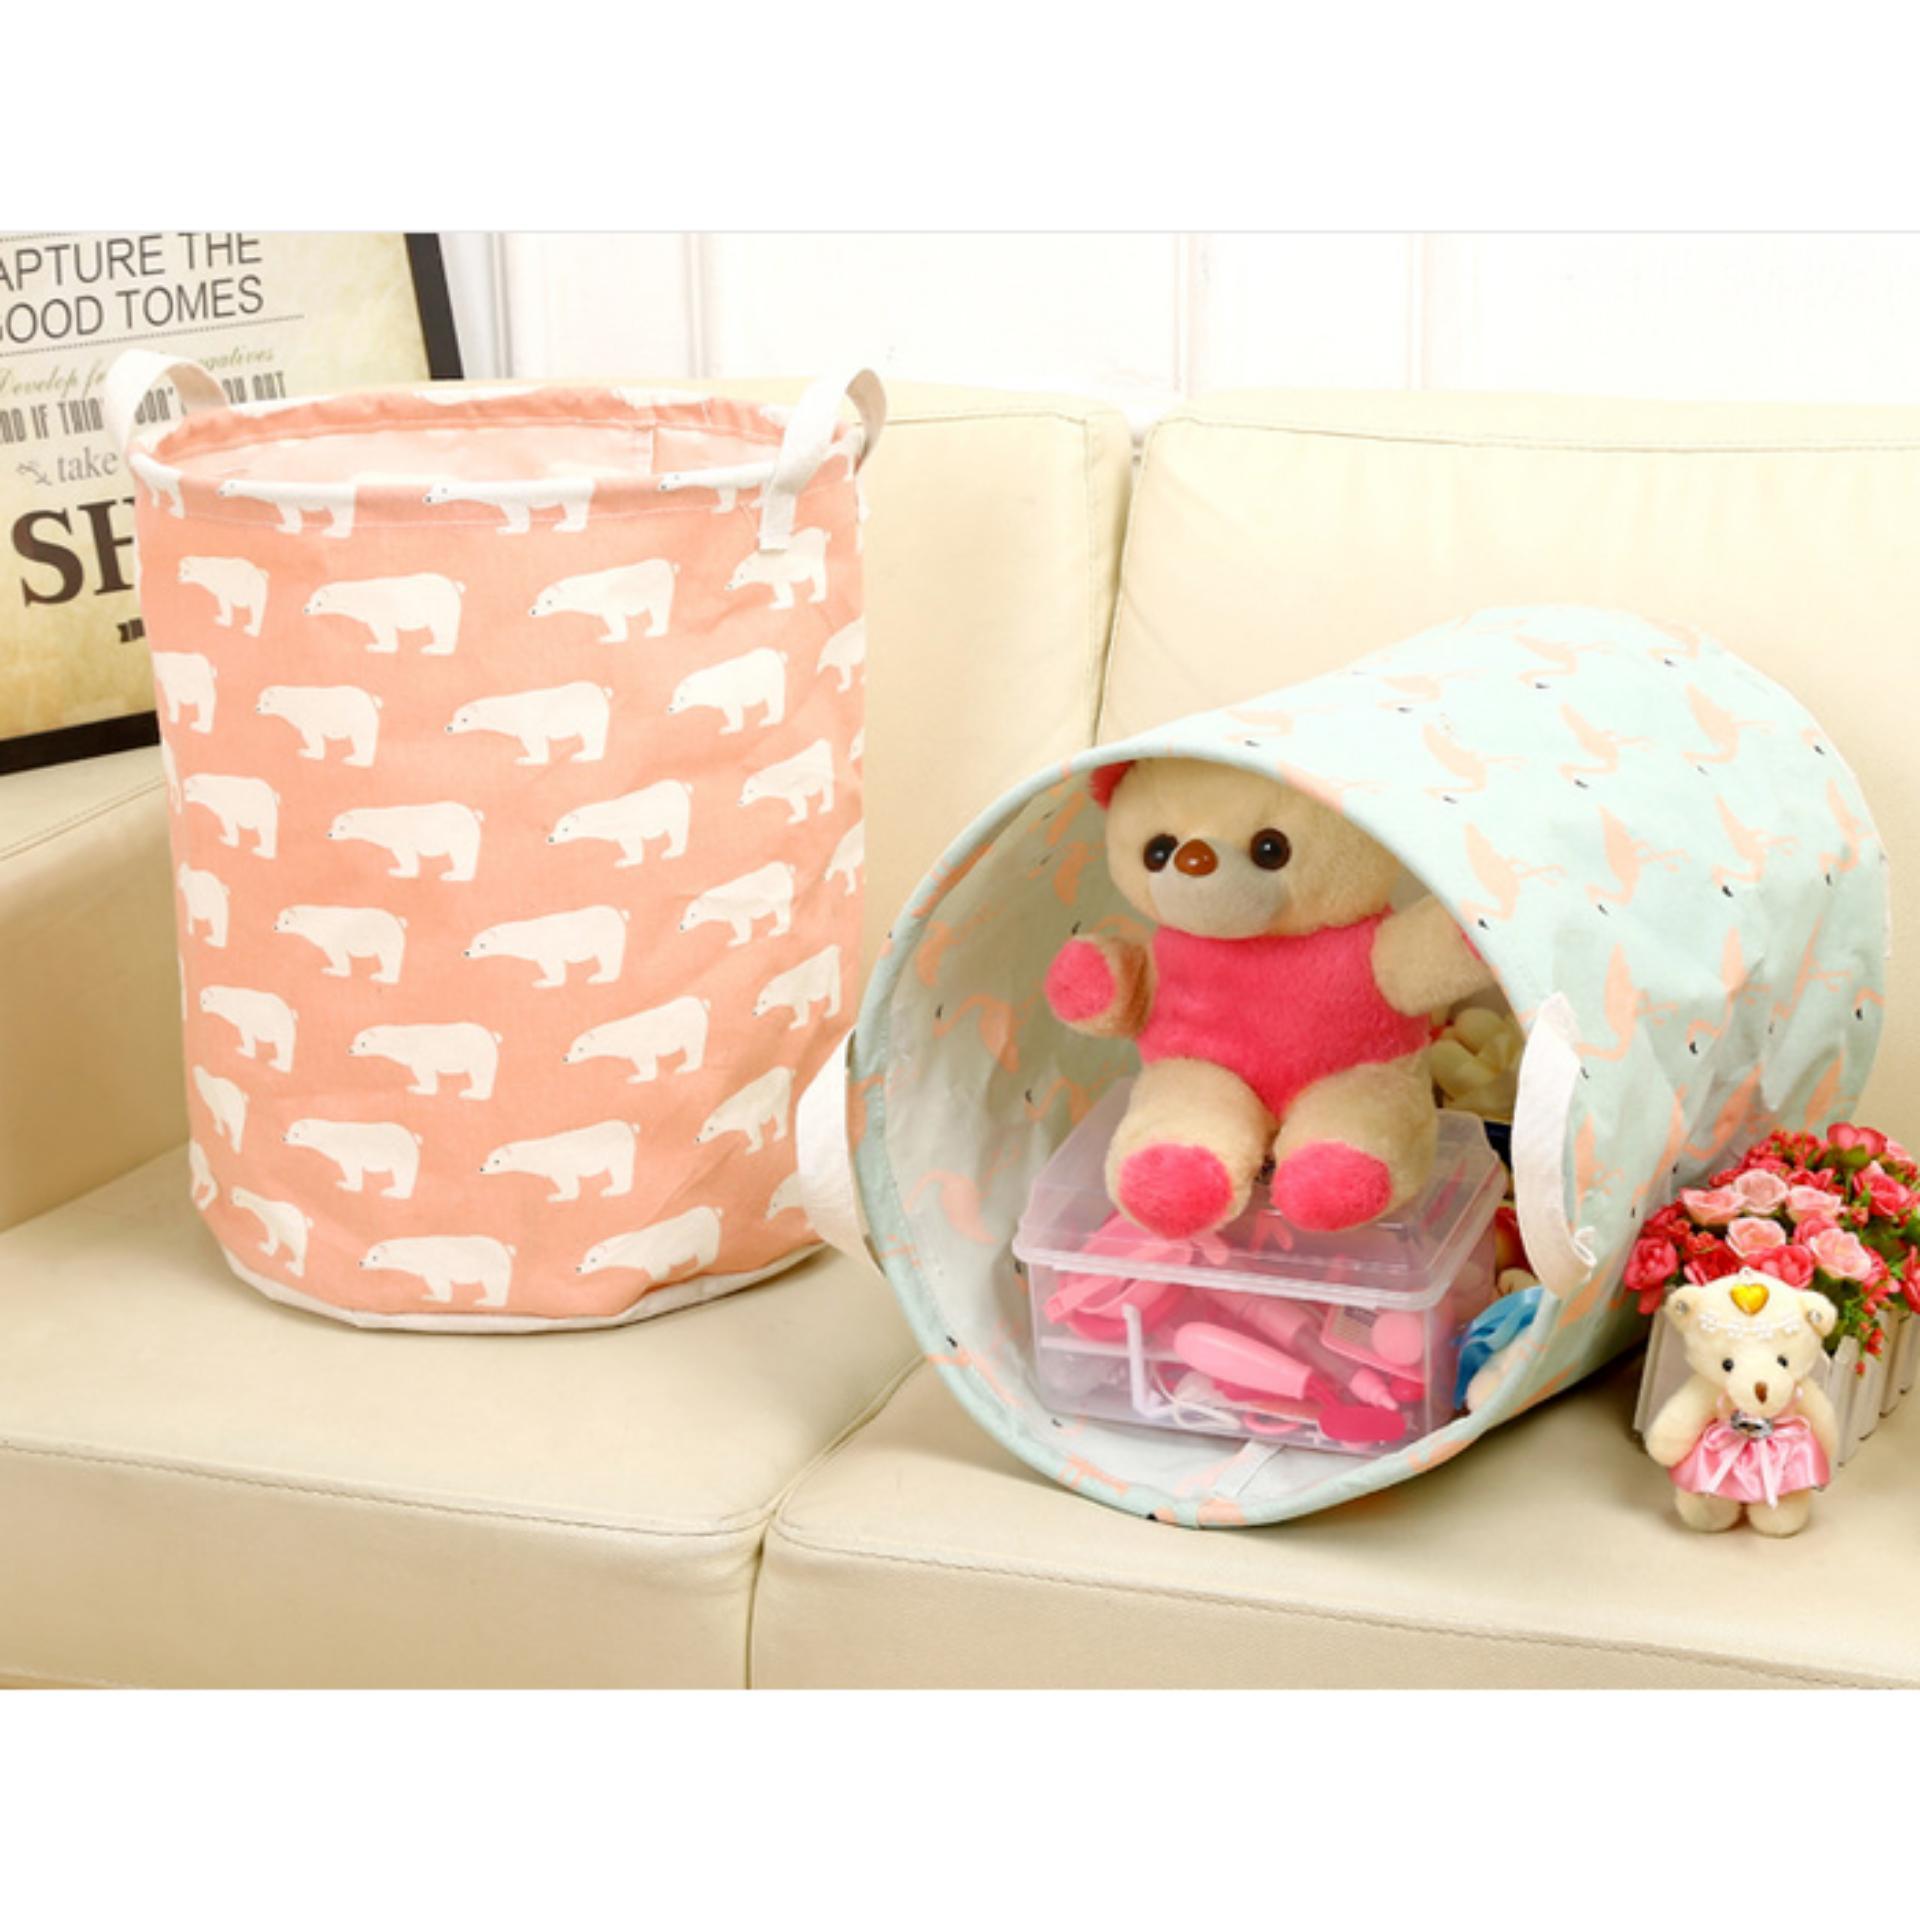 Keranjang penyimpanan keranjang pakaian bersih keranjang pakaian bayi 0026 Pink Bear